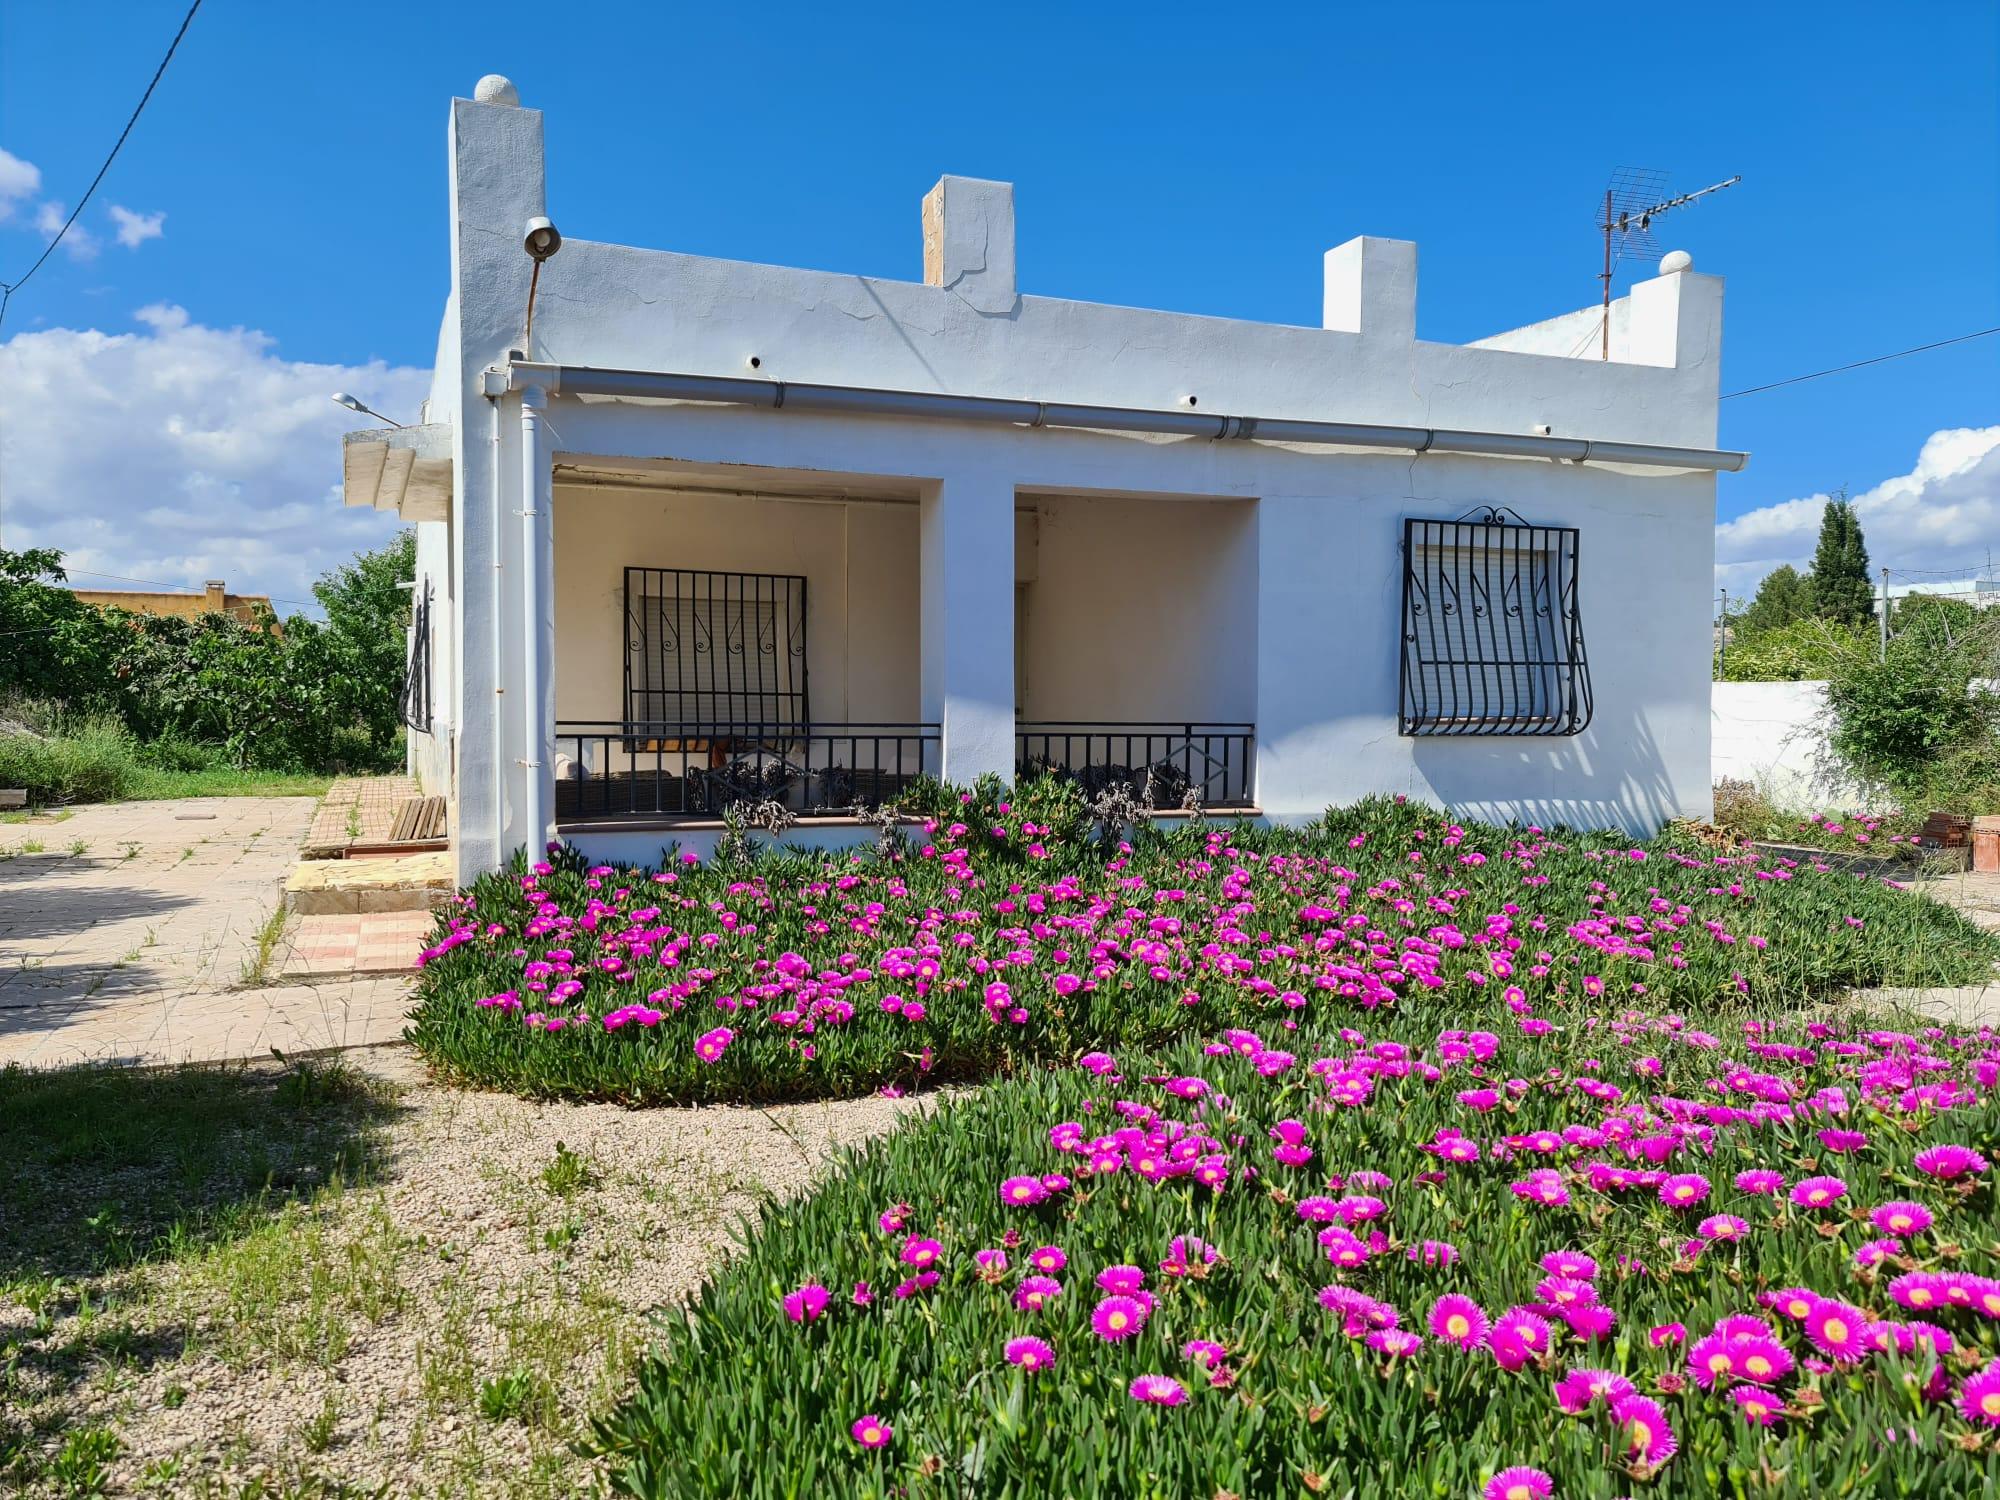 3 bedroom house / villa for sale in Sax, Costa Blanca